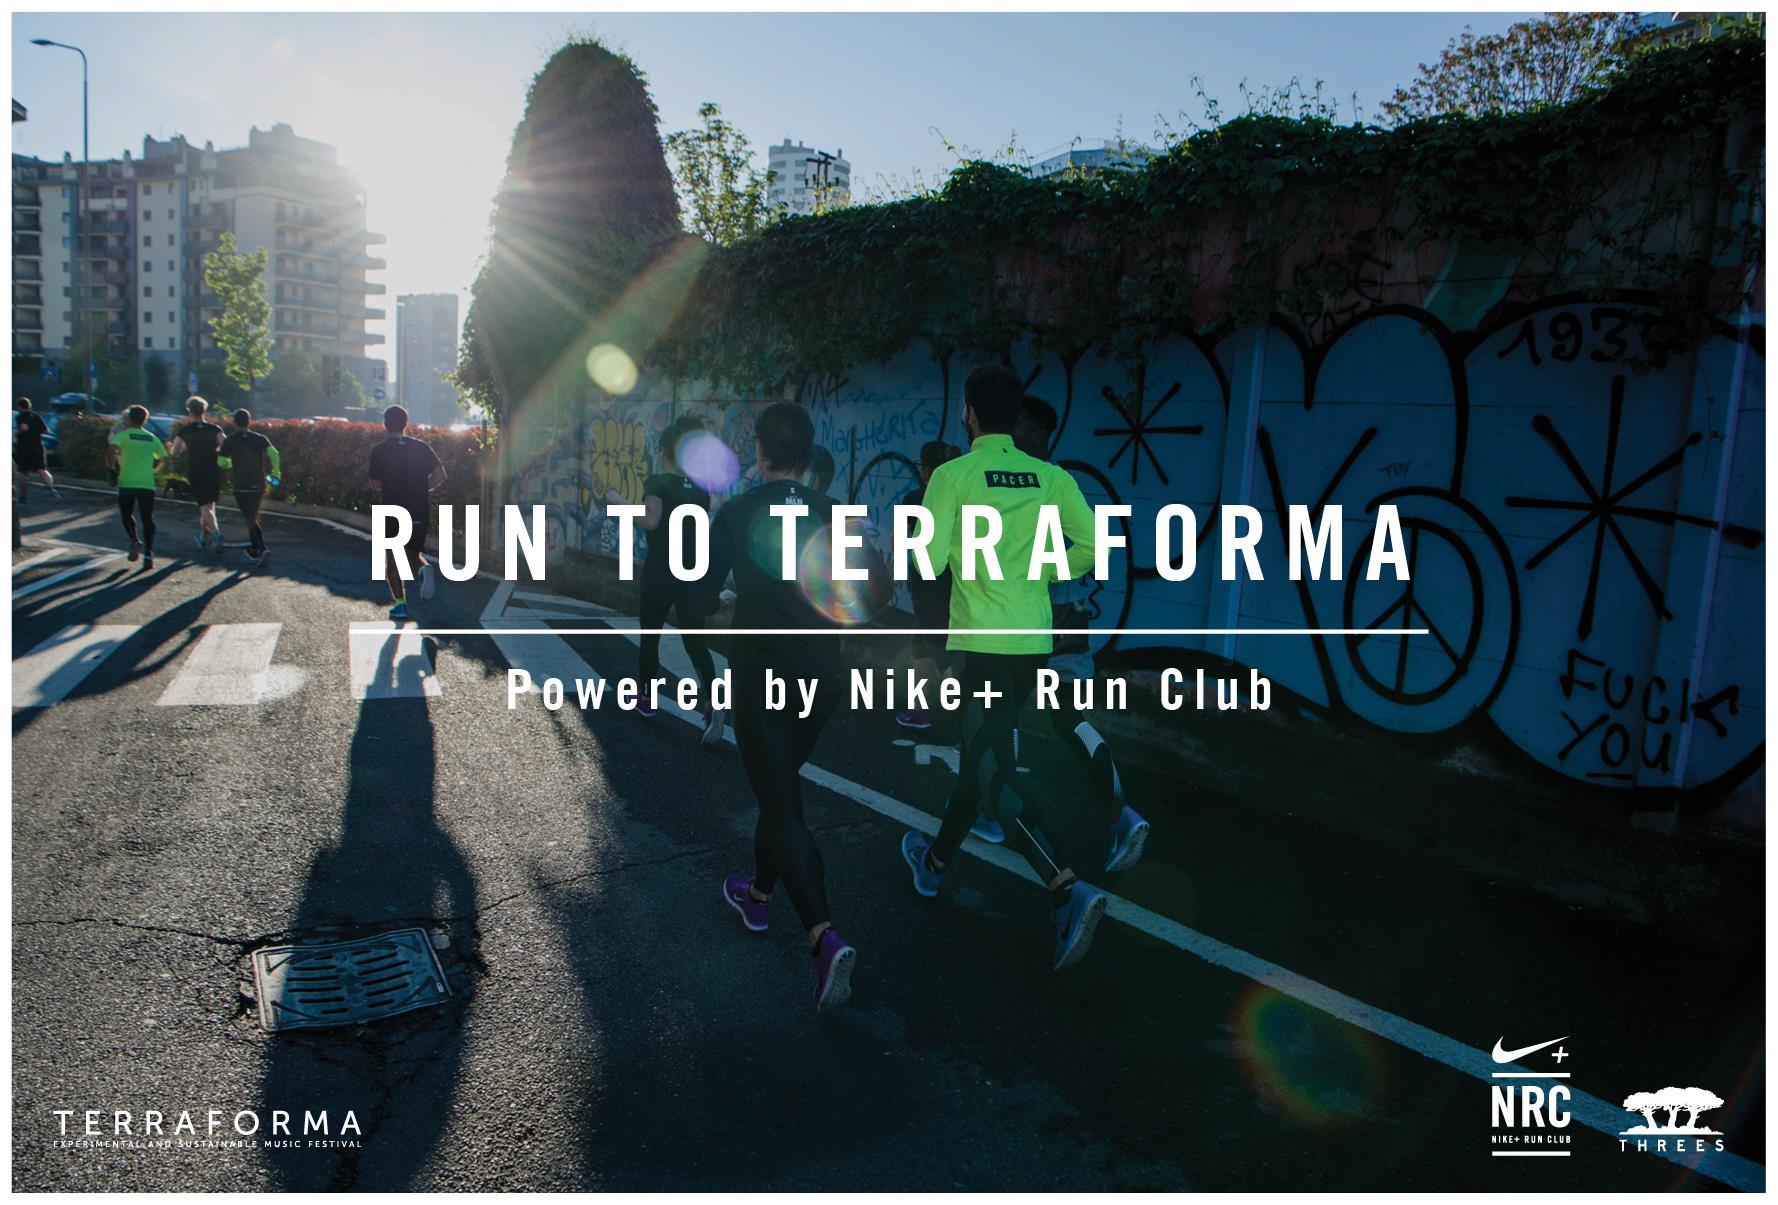 RUN TO TERRAFORMA